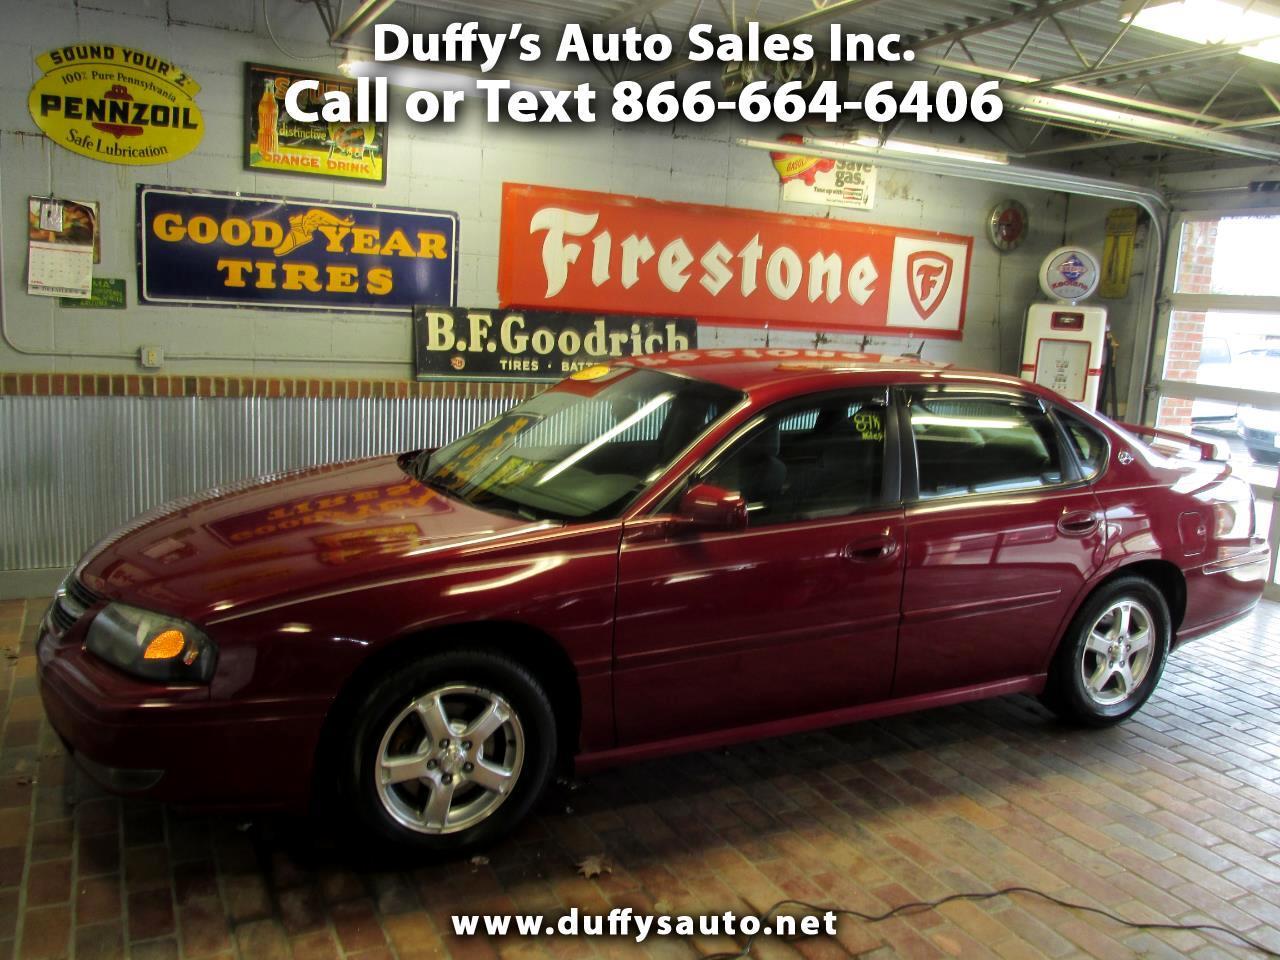 2005 Chevrolet Impala 4dr Sdn LS